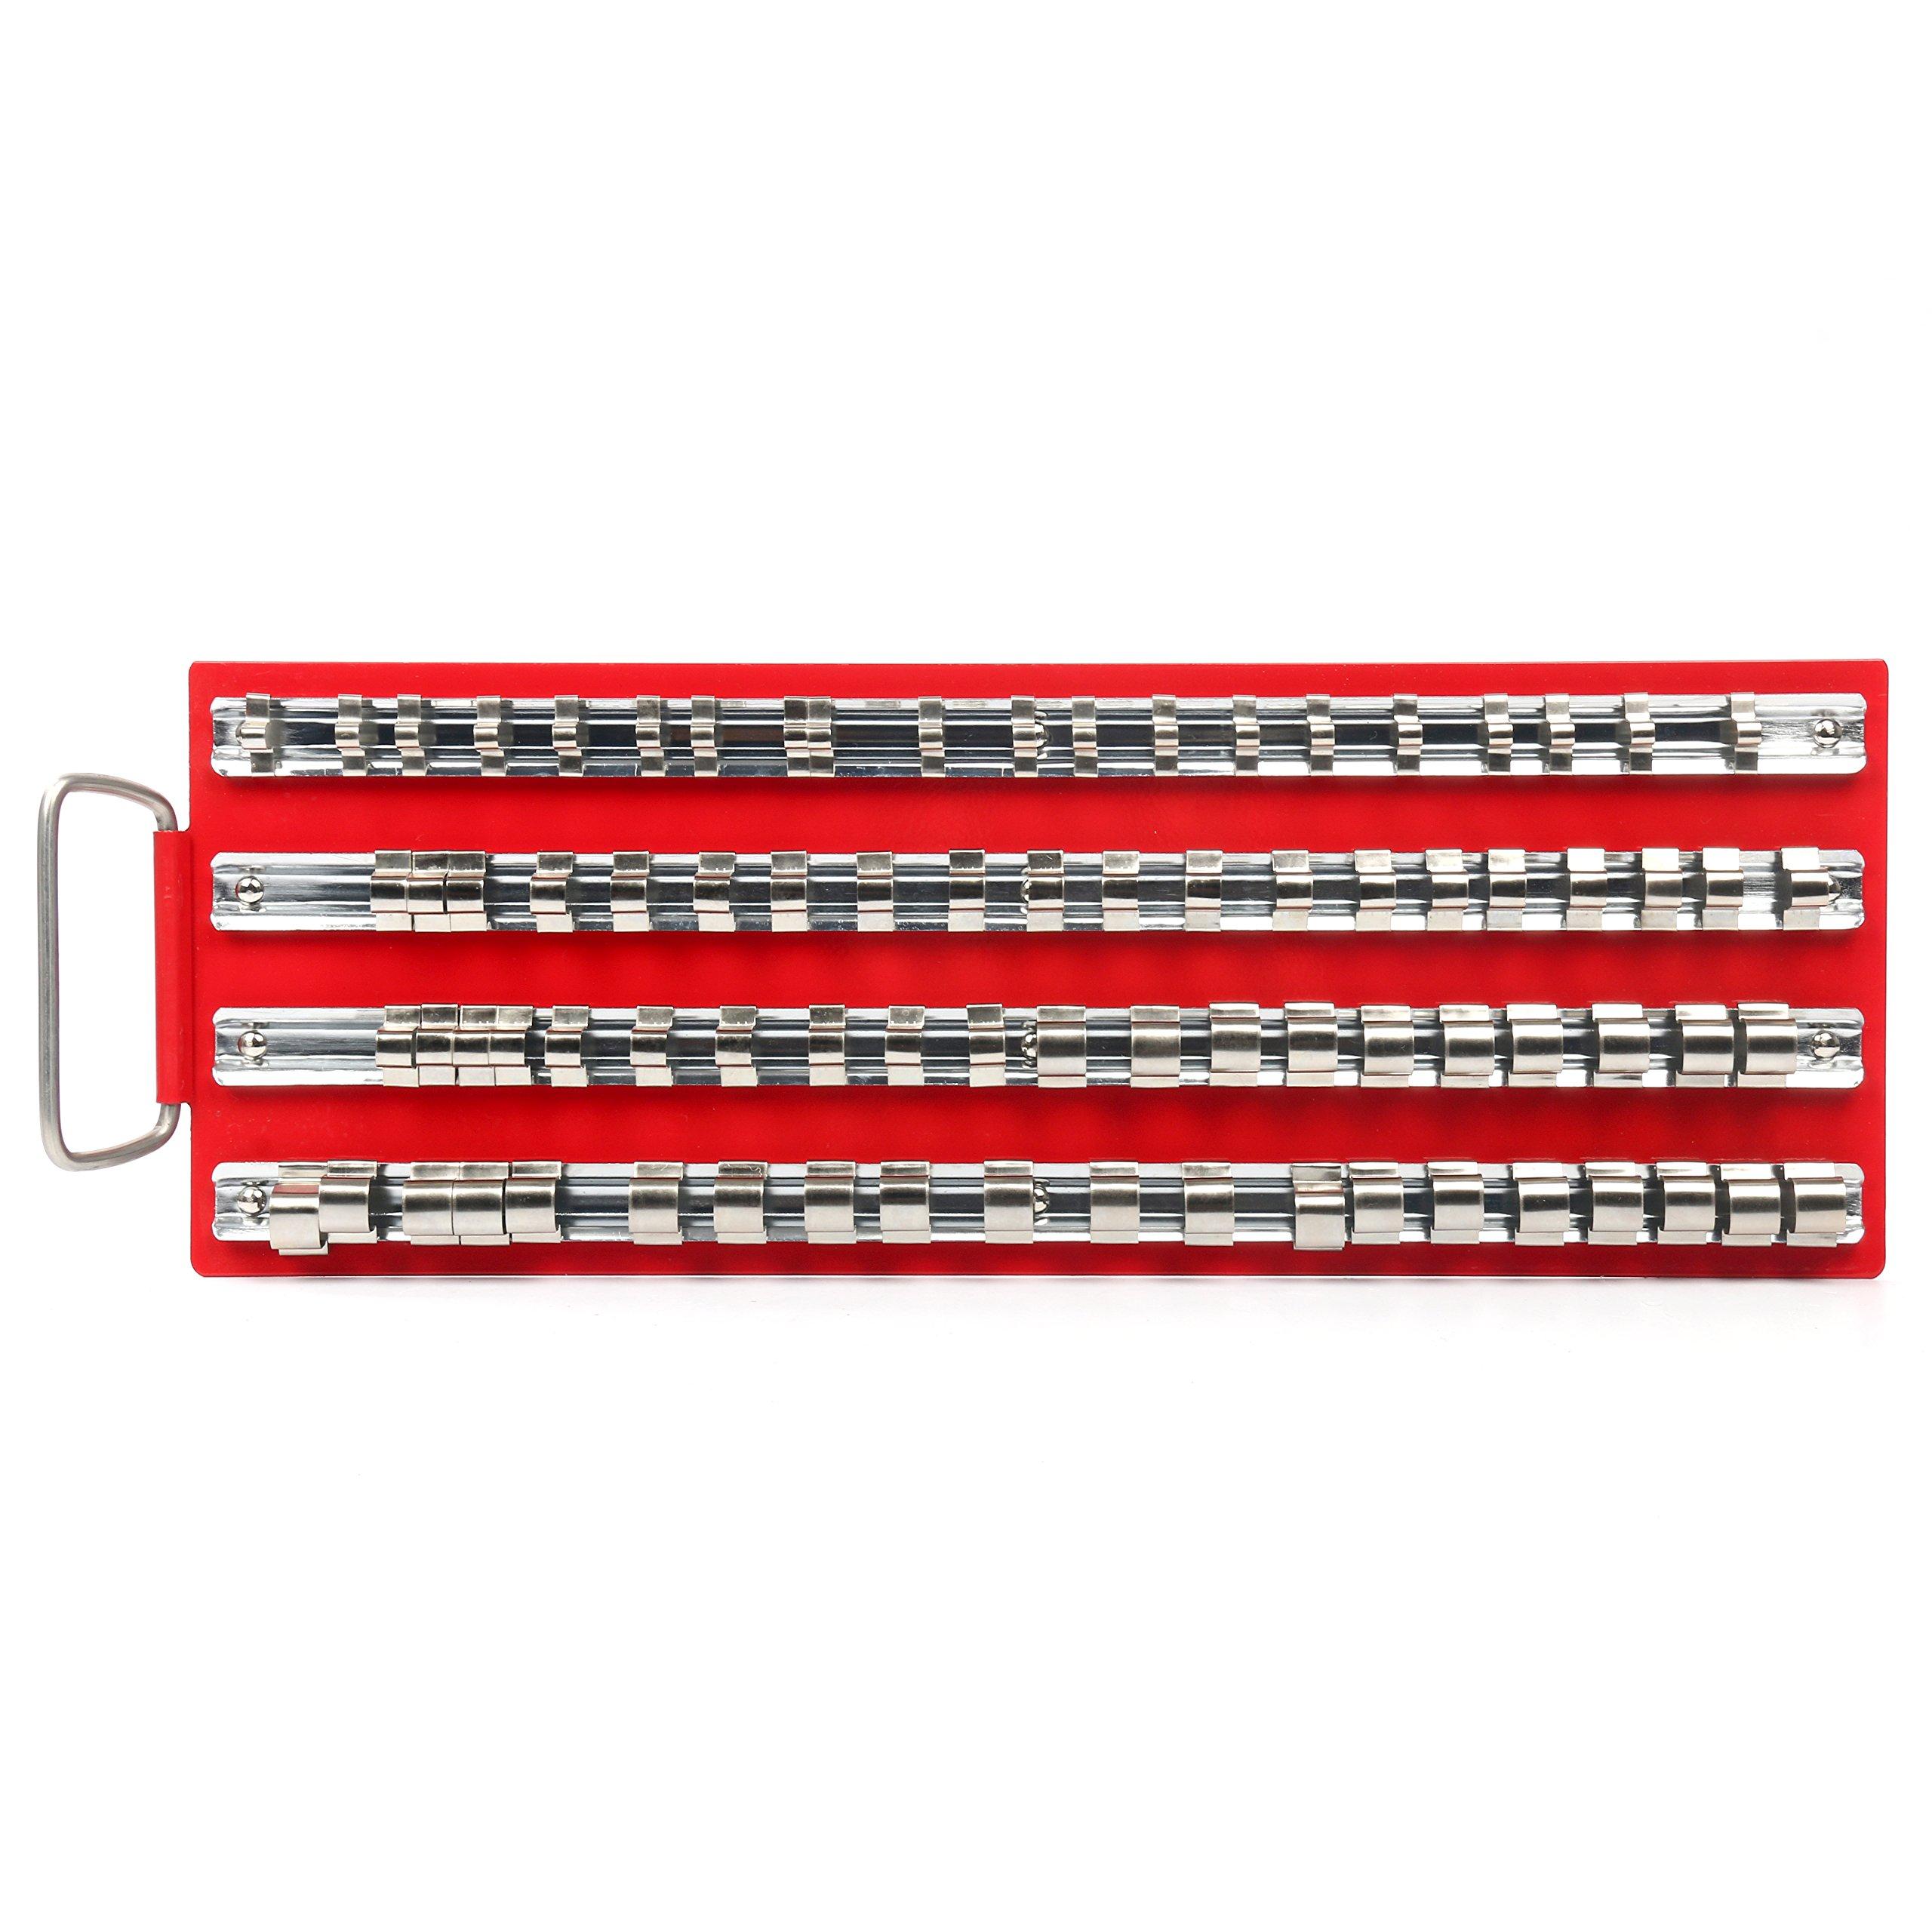 "Yaetek Universal Socket Holders in Organizer Tray Metal Rail   80-Piece Set   1/4"", 3/8"" and 1/2"" Multi-Drive Set"